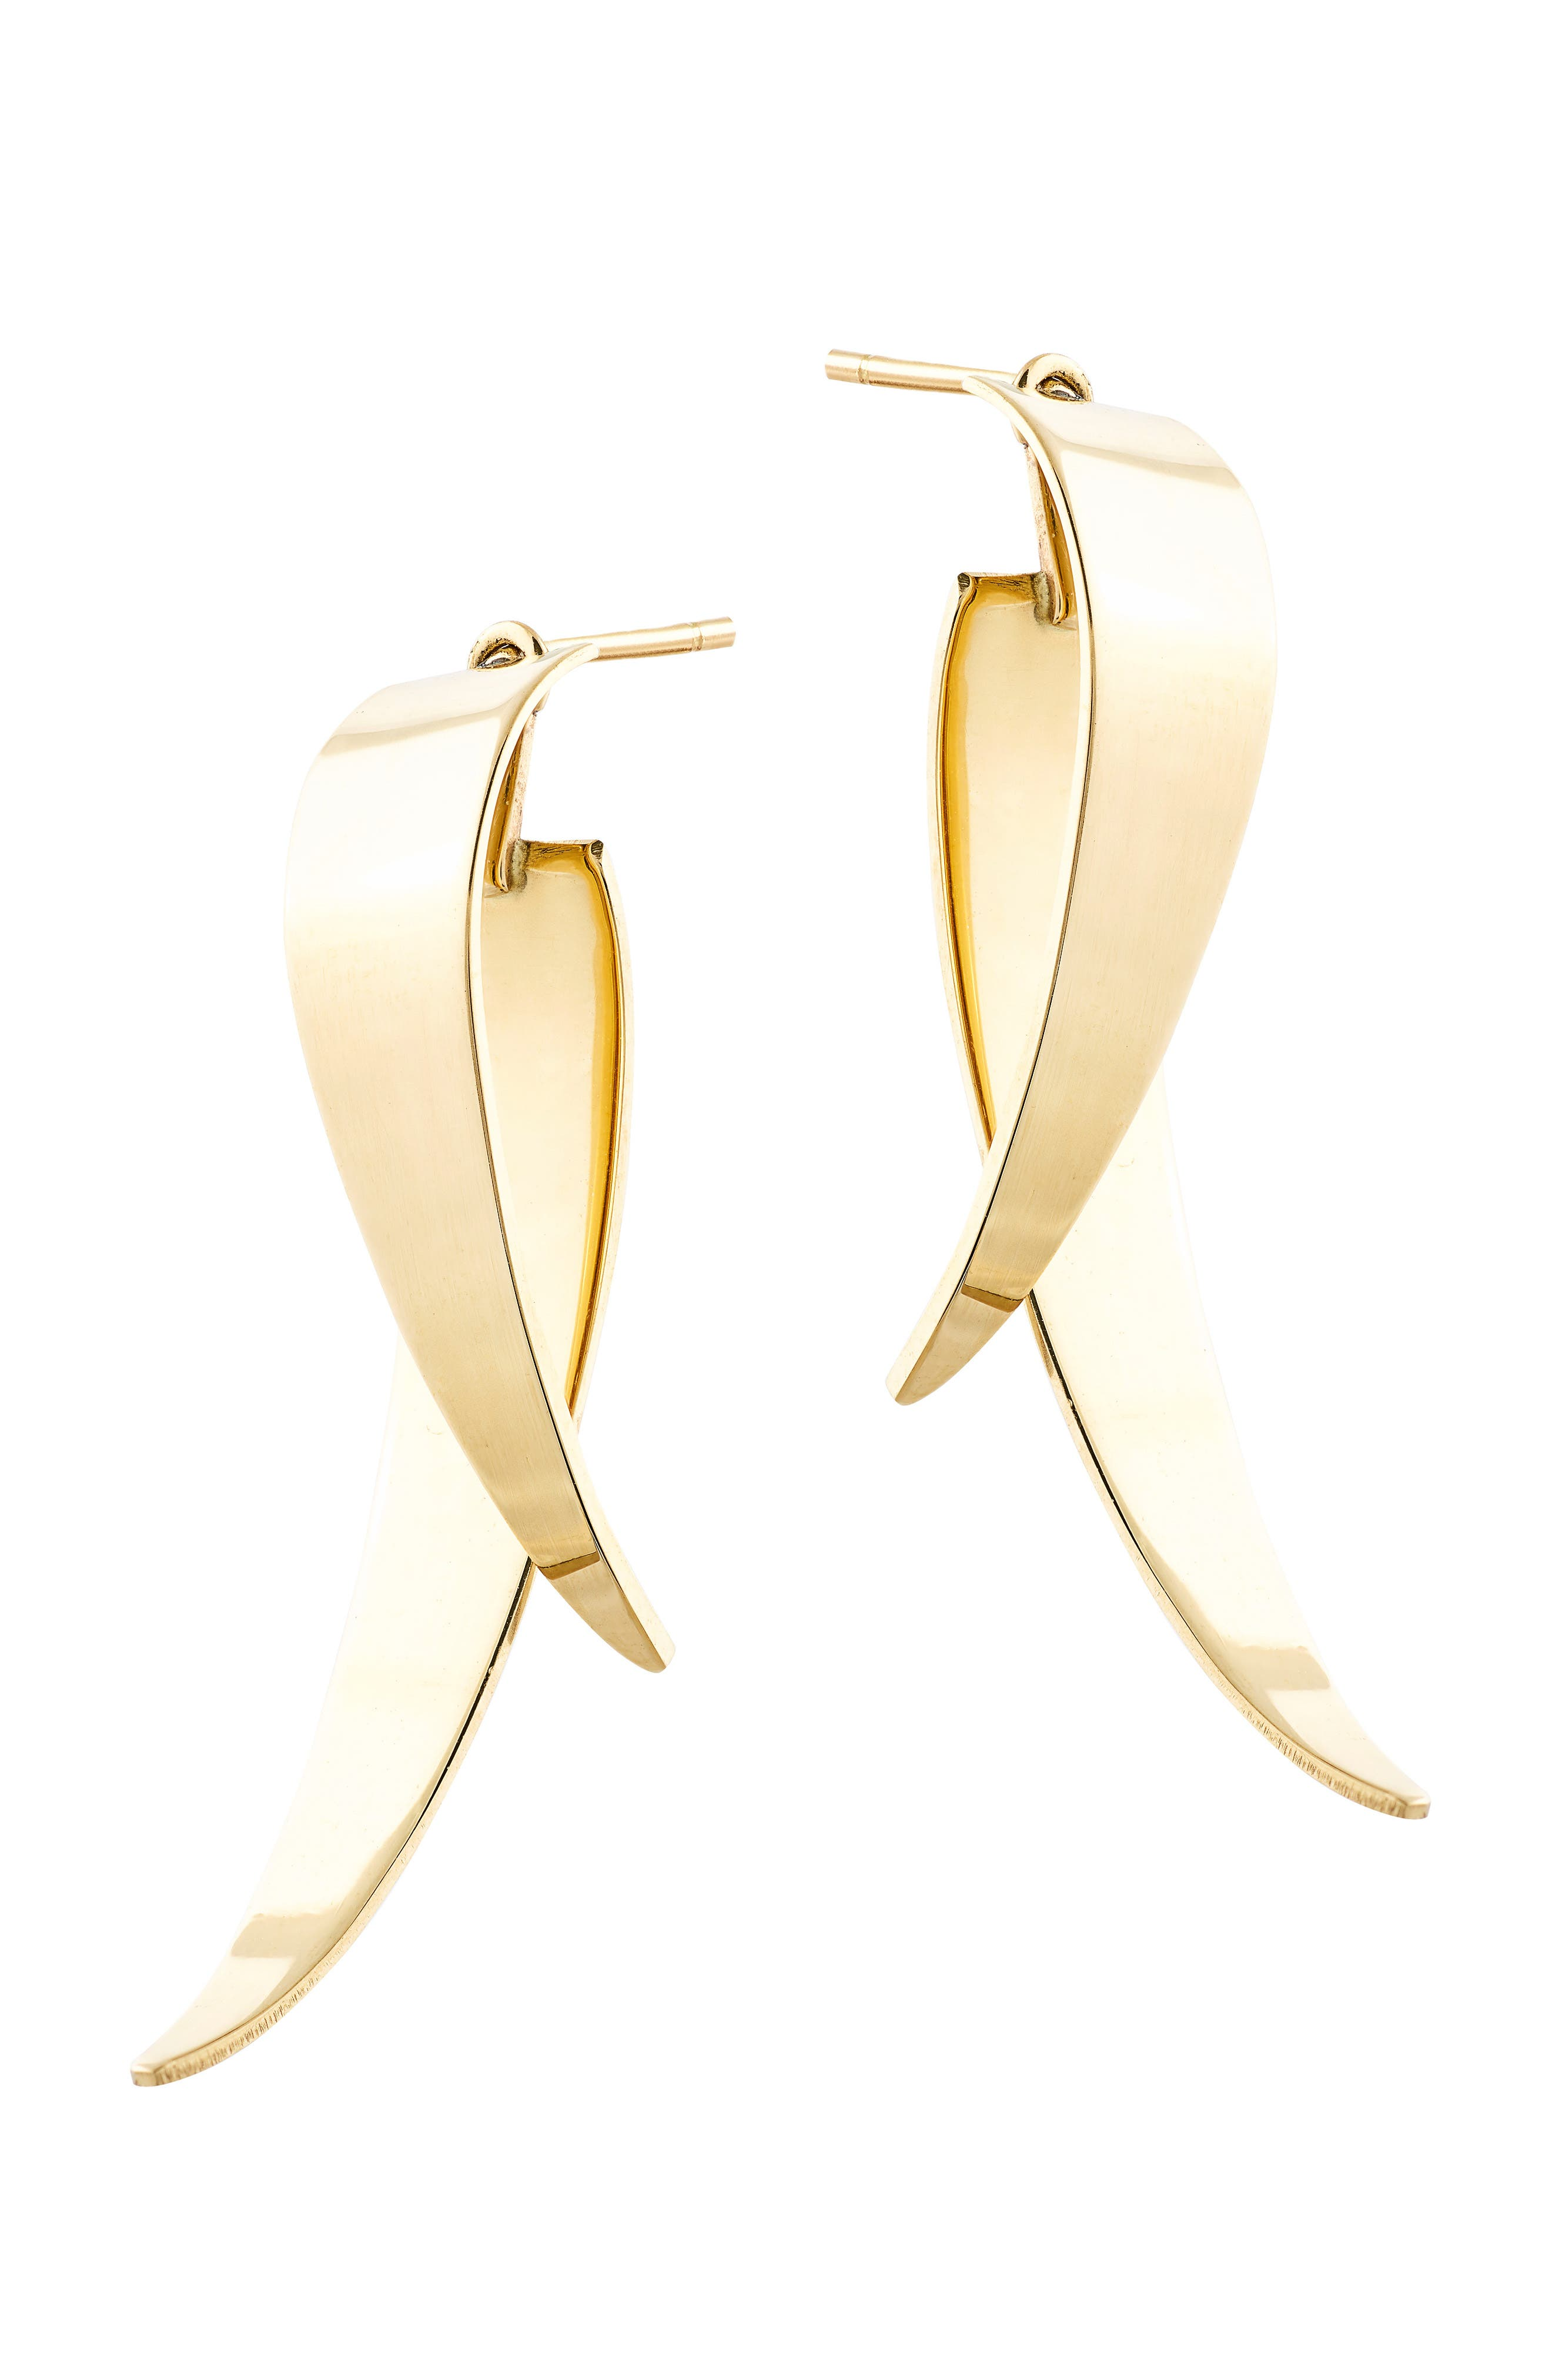 Alternate Image 1 Selected - Lana Jewelry Bond Double Dagger Stud Earrings